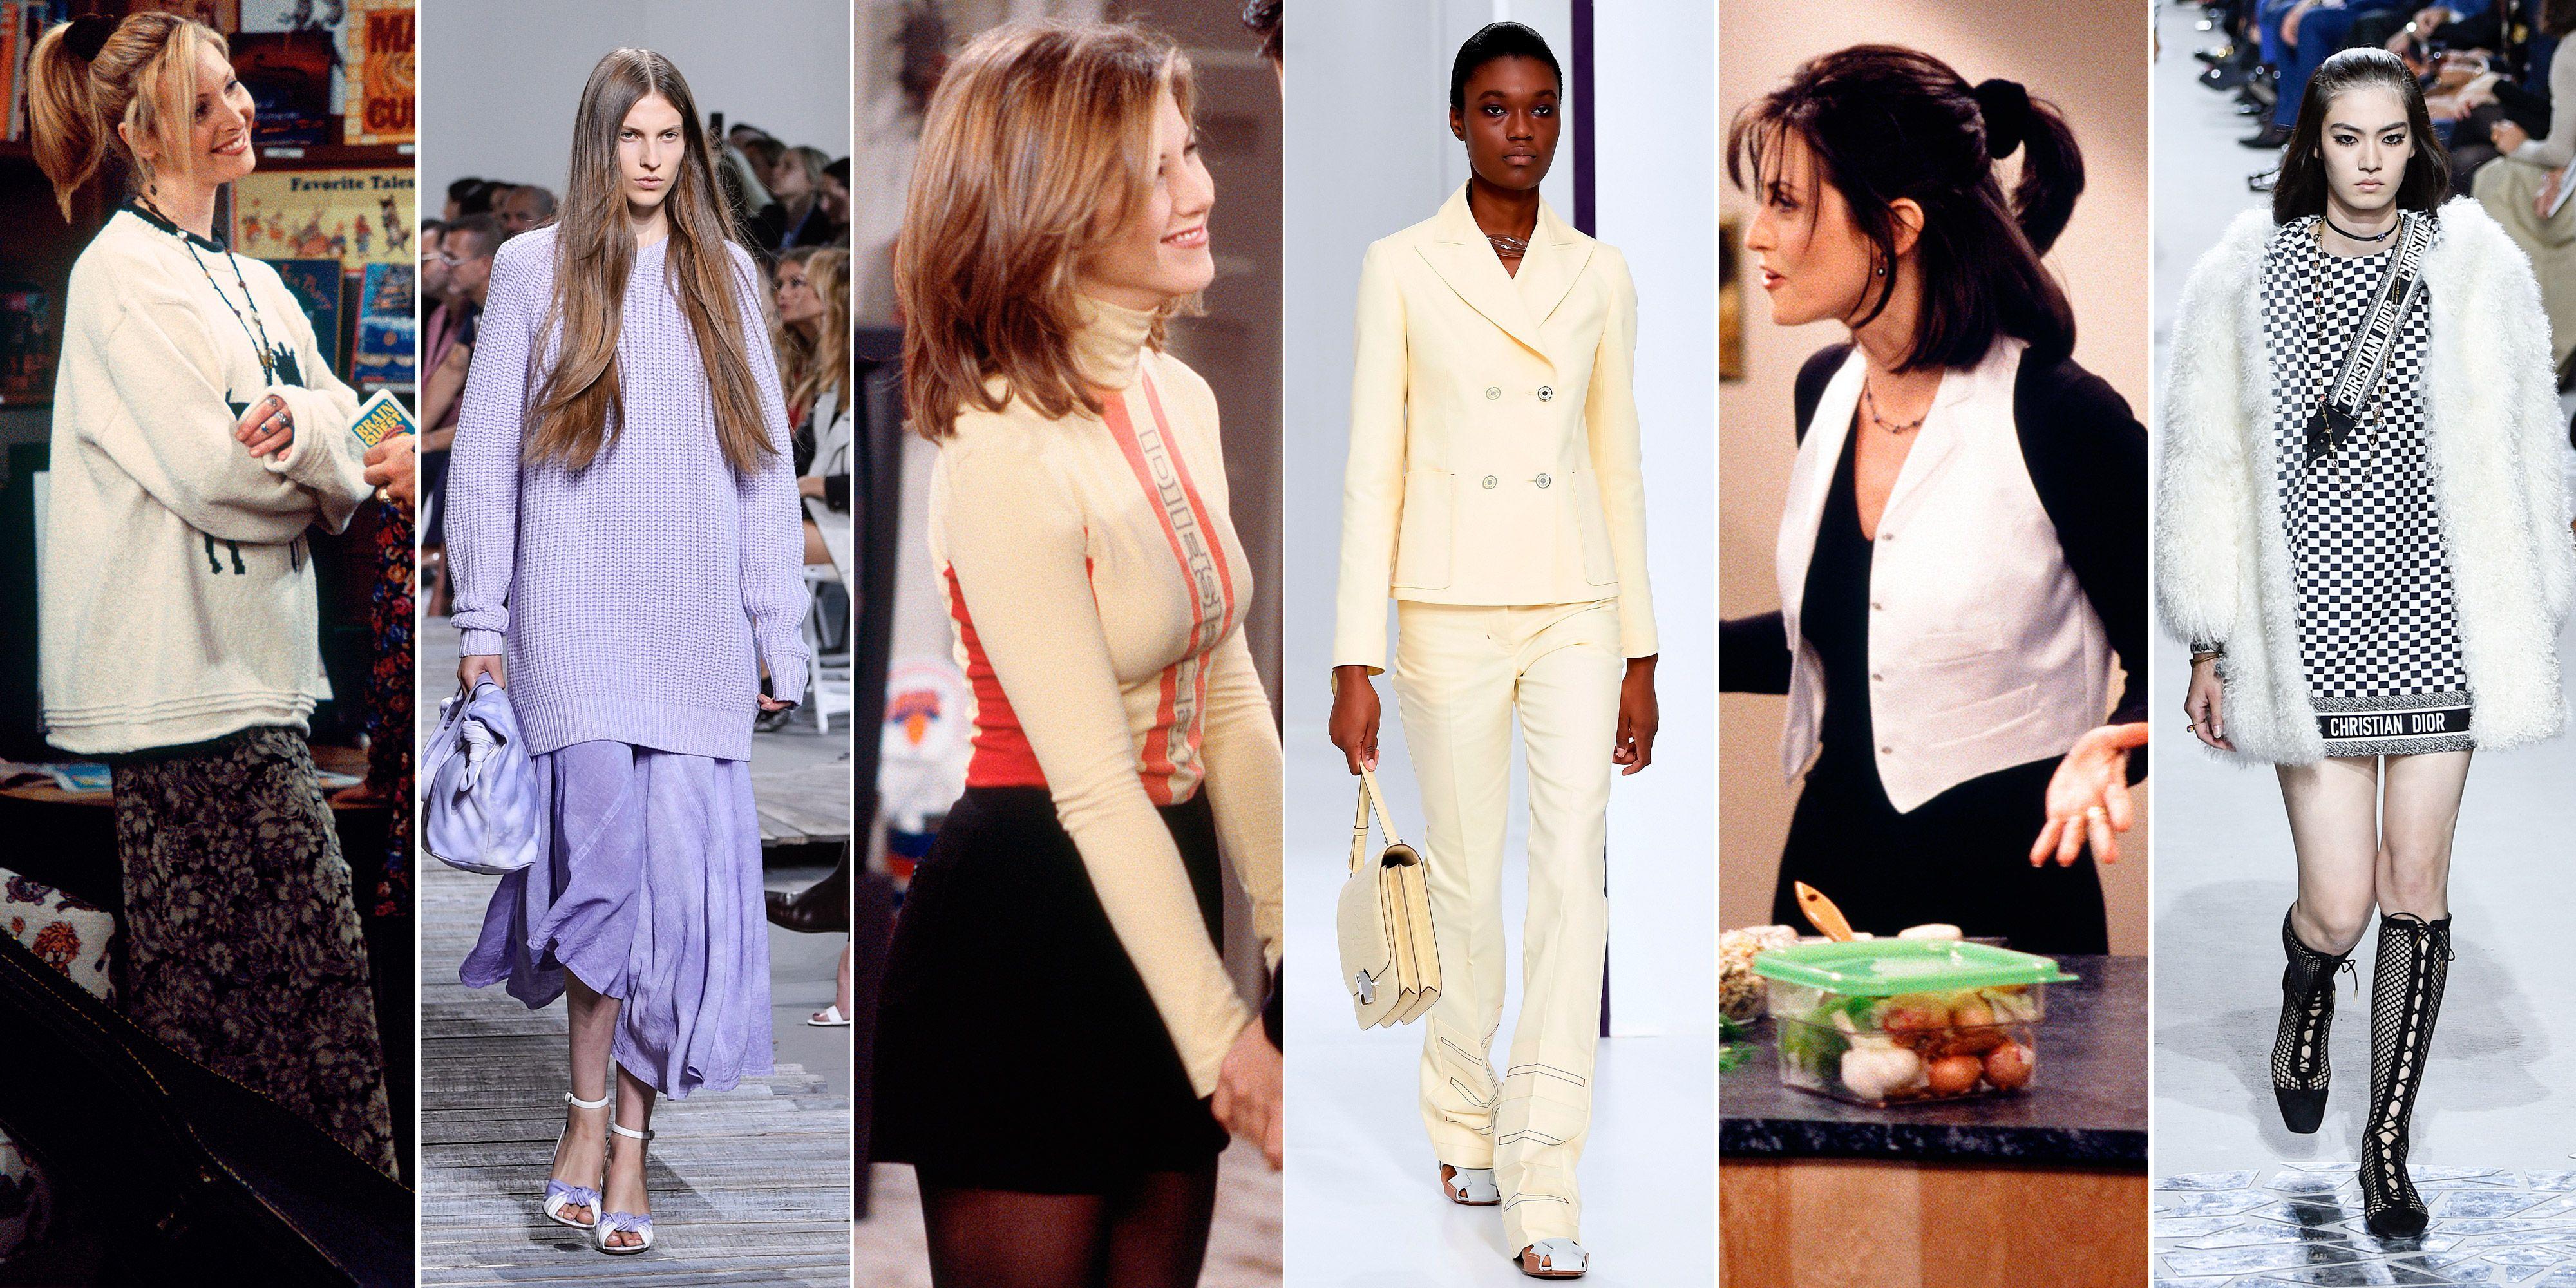 Friends fashion trends